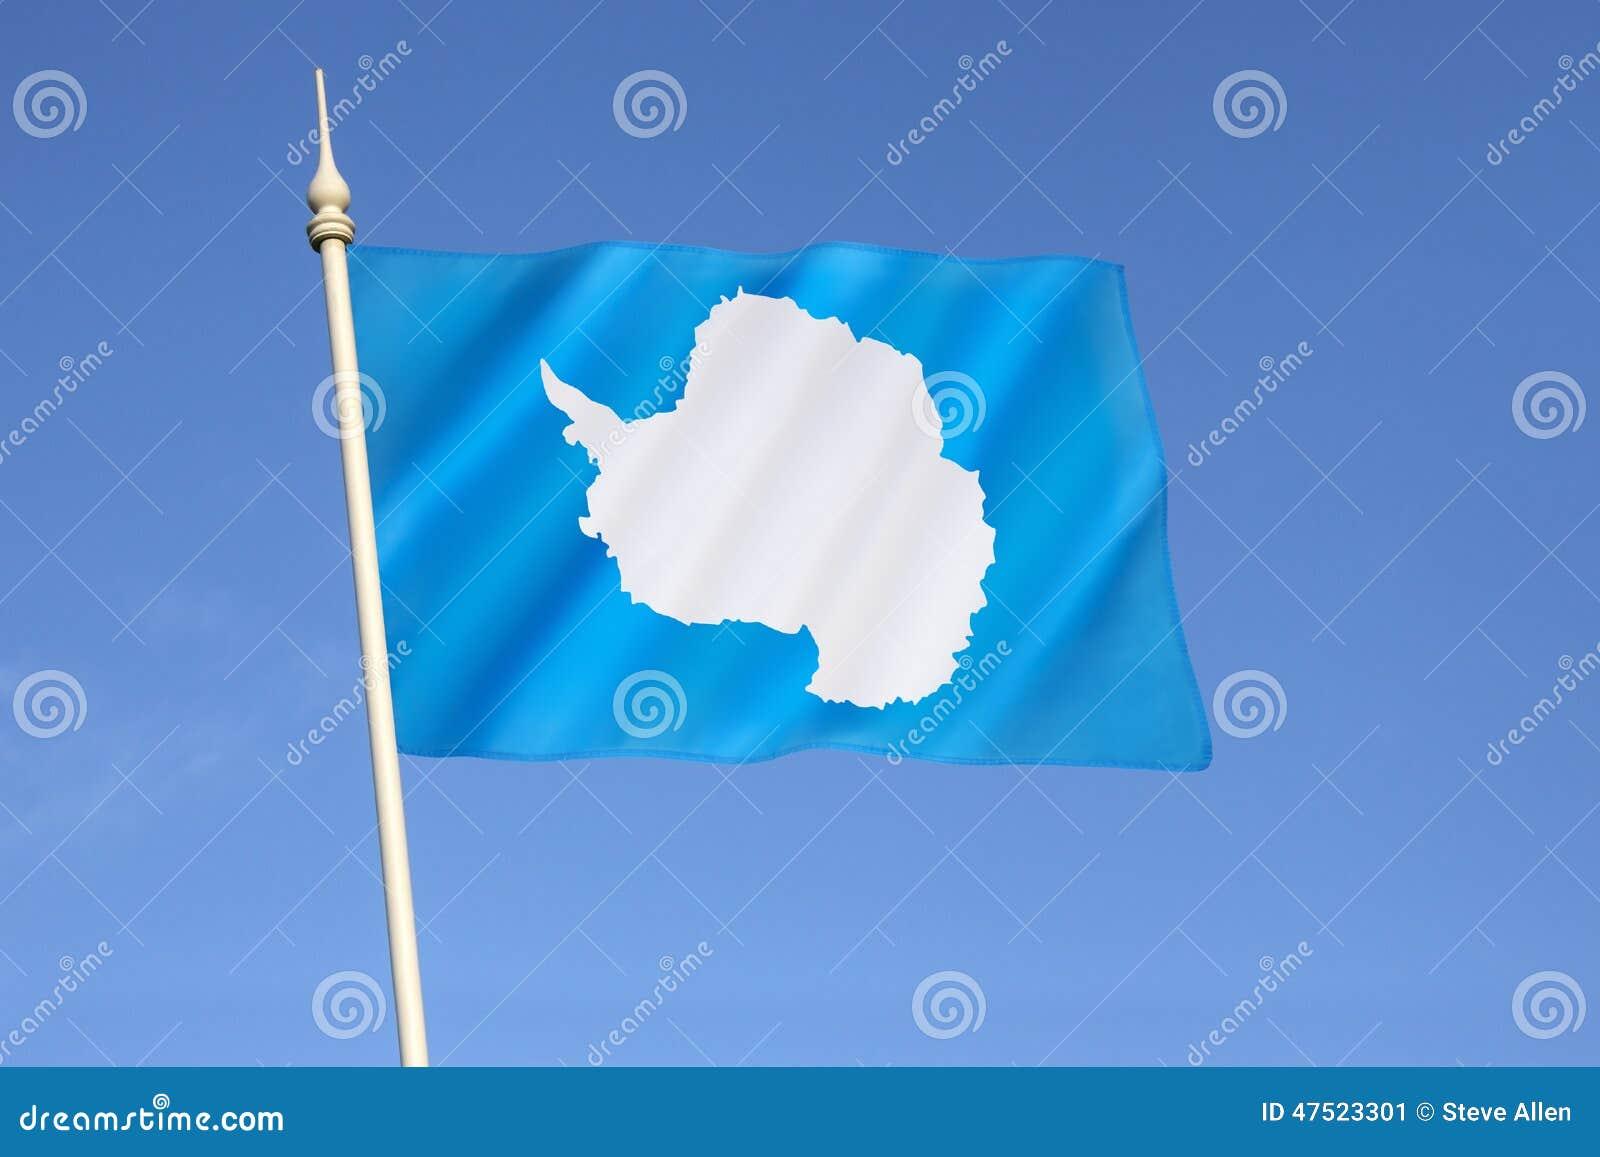 Flag Of Antarctica Stock Photo - Image: 47523301